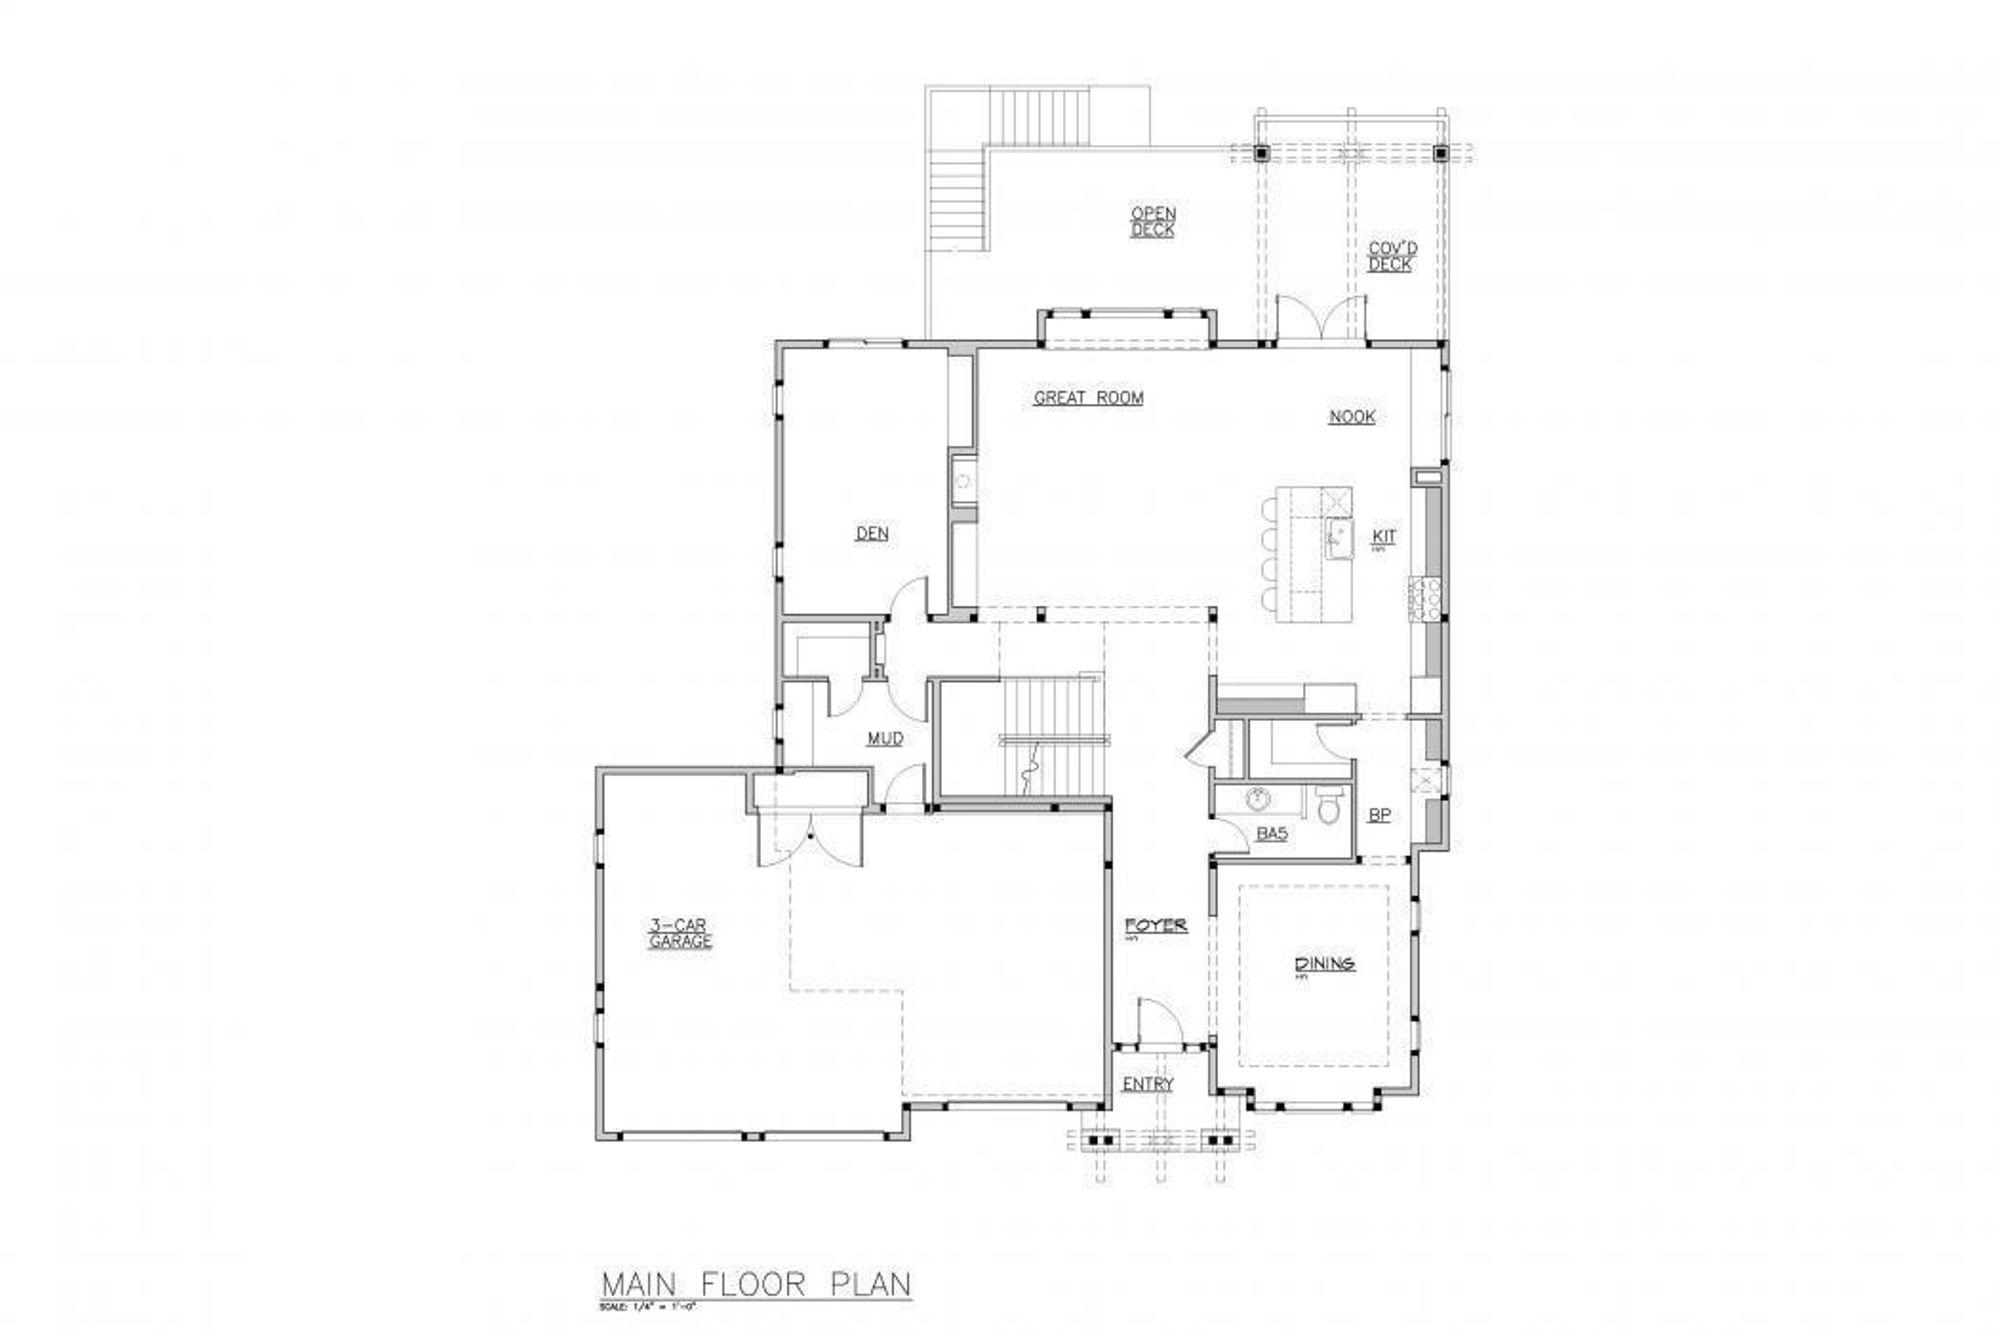 2005_105th_ave_ne-_main_floor.jpg